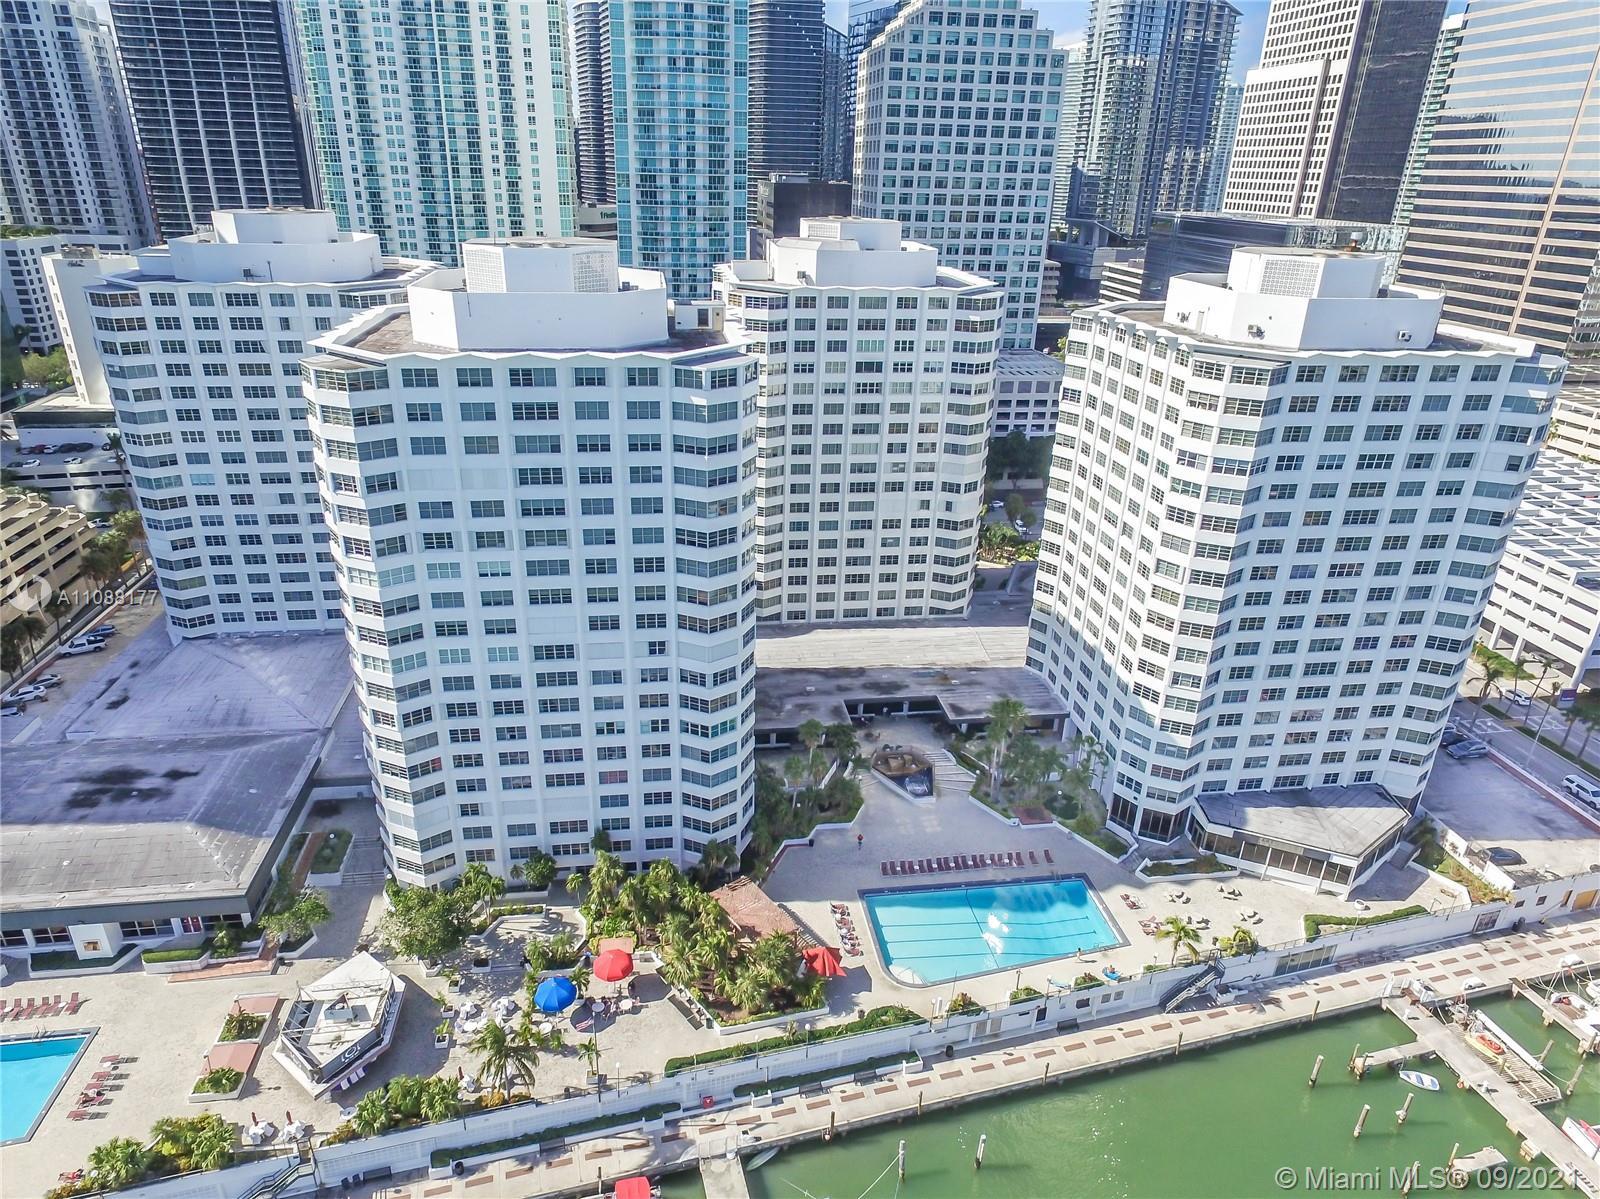 Courts Brickell Key #1462 - 801 Brickell Bay Dr #1462, Miami, FL 33131